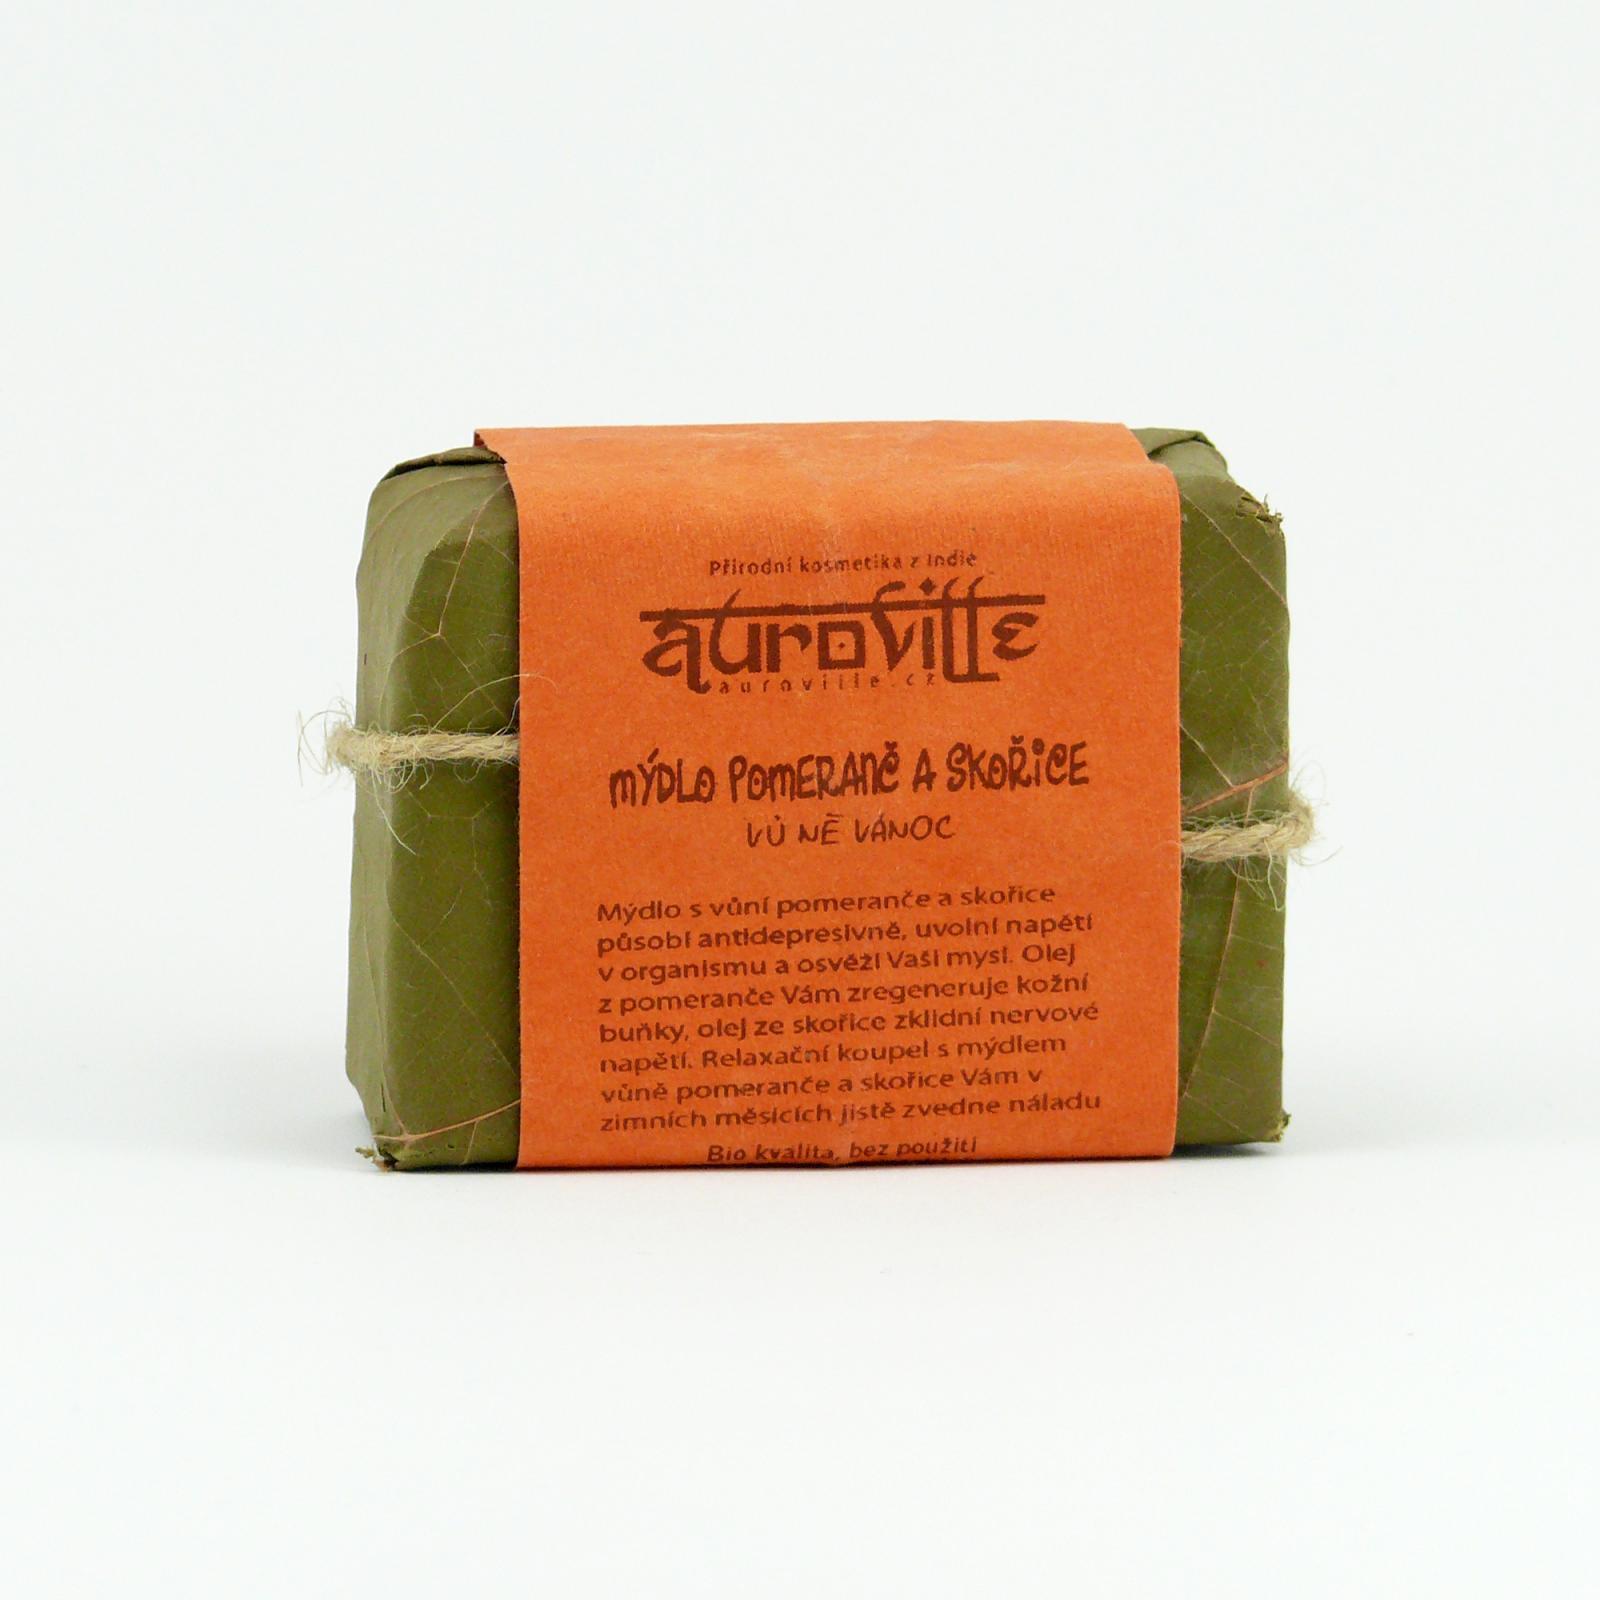 Auroville Mýdlo pomeranč a skořice, Bon Auroville 100 g